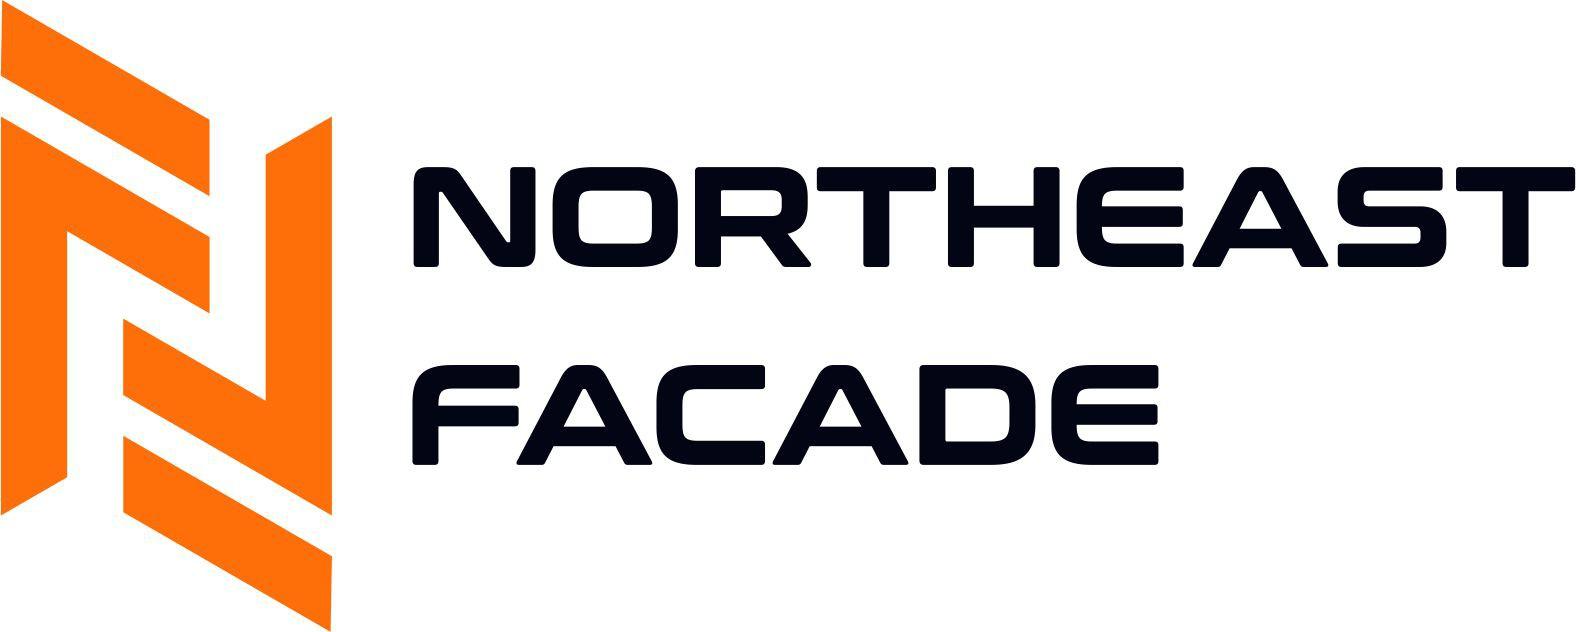 Stucco Architectural trim manufacturer startup seeks logo